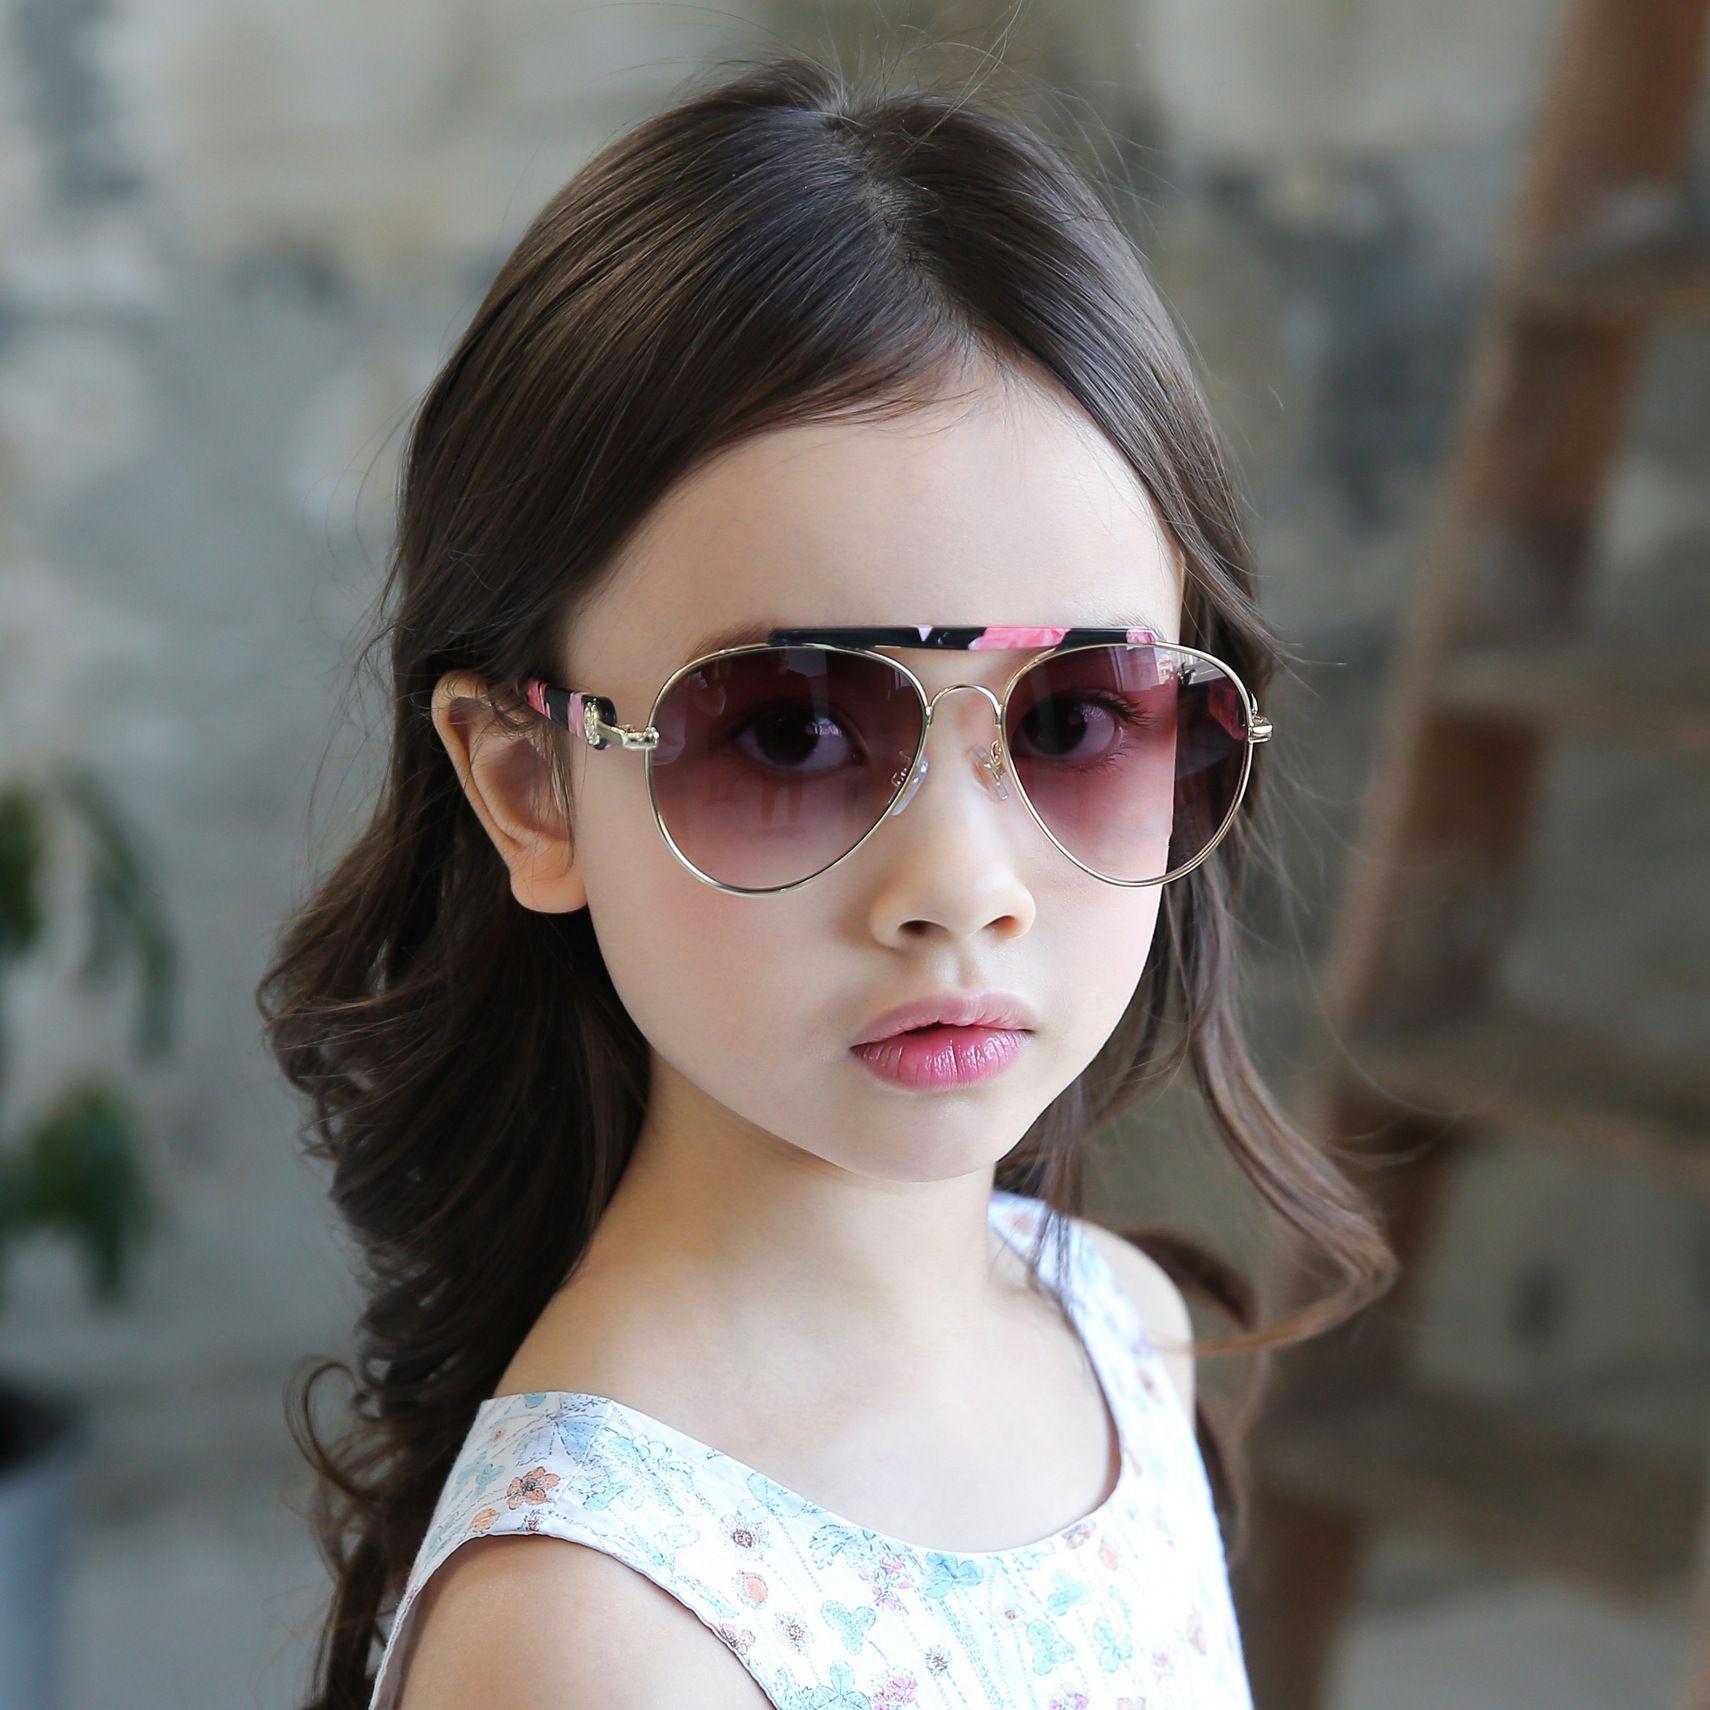 9b0af40f6b 2019 Designer Brand Aviator Sunglasses Kids Alloy Frame Sun Glasses Boys  Girls Oval Mirrored Sunglasses Goggles From Hiscreativepark